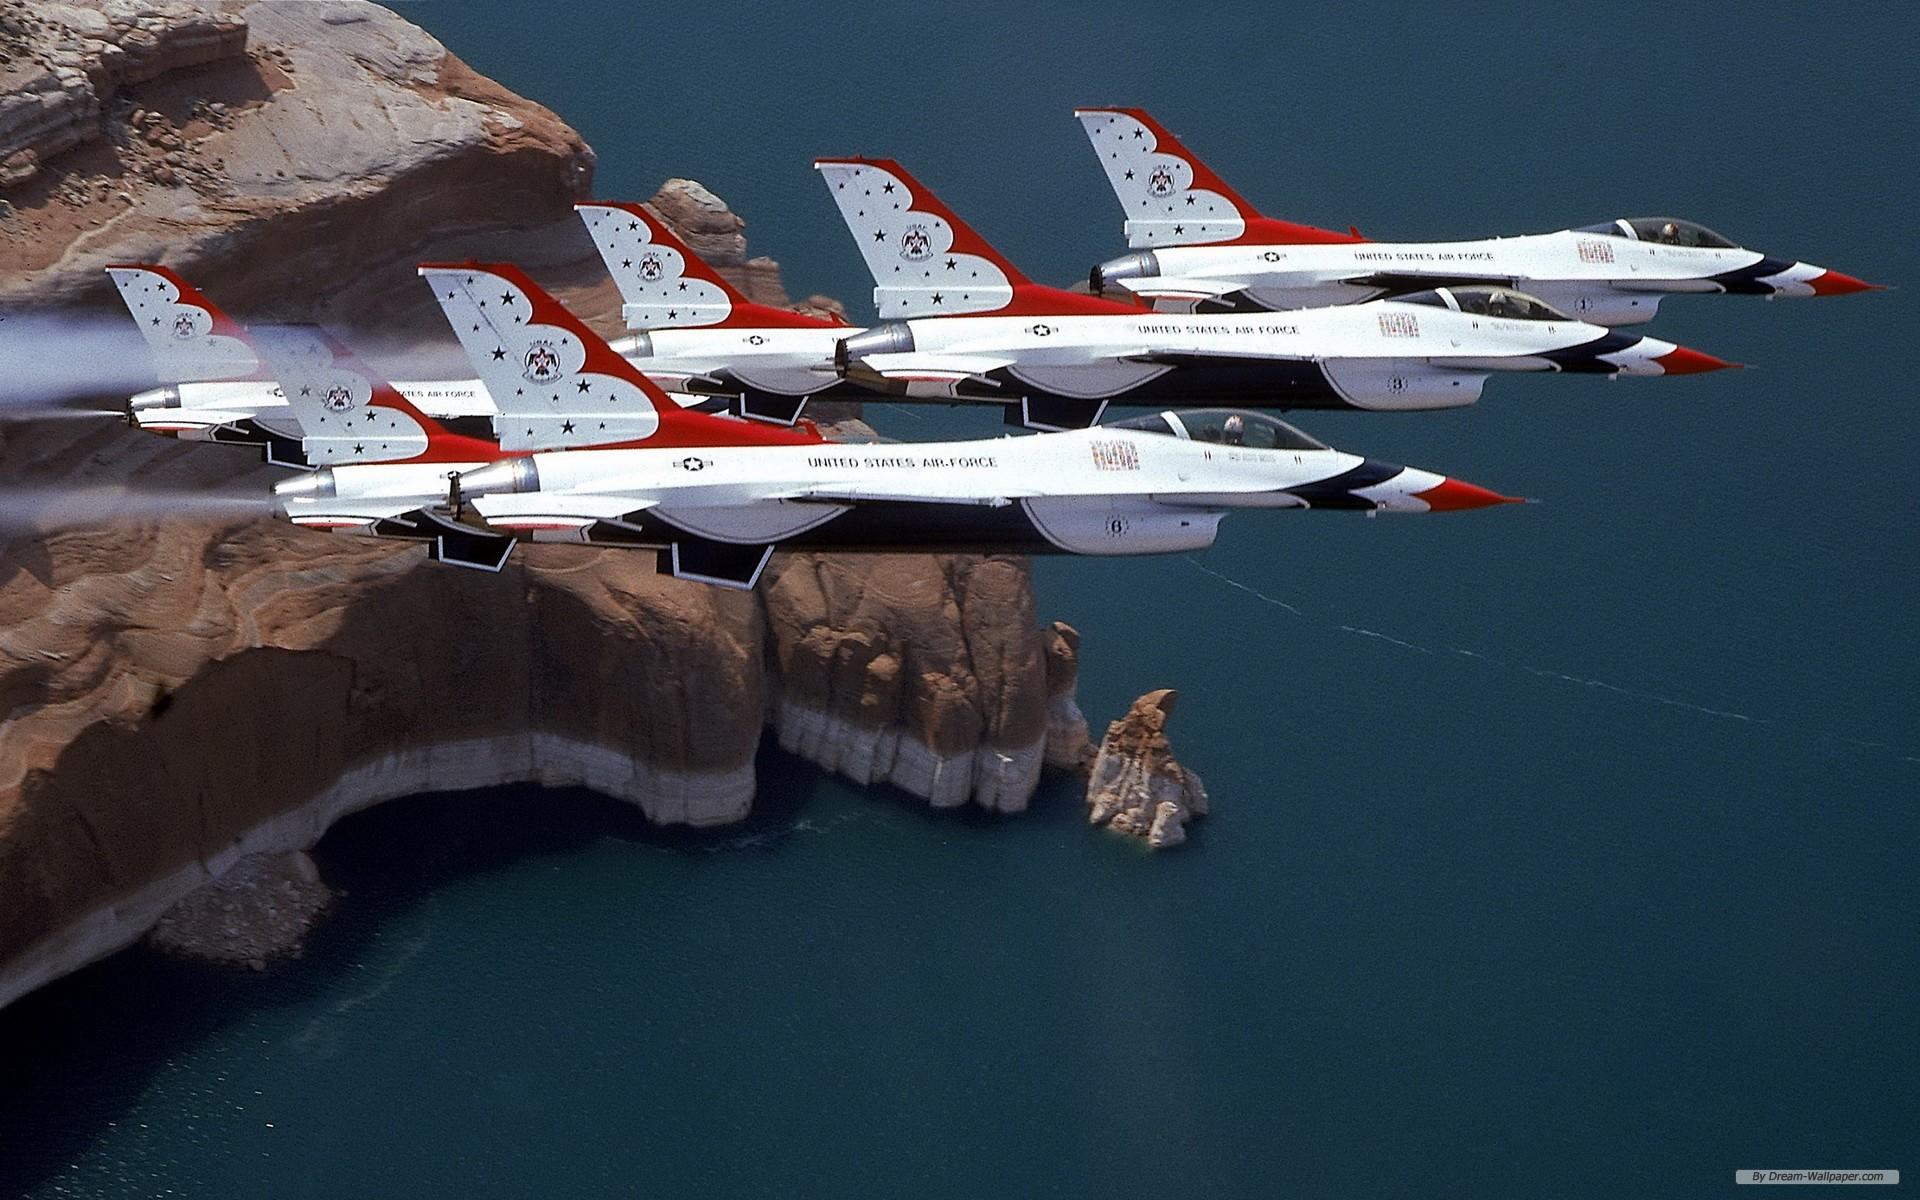 Photography wallpaper   USAF Thunderbirds wallpaper   1920x1200 1920x1200